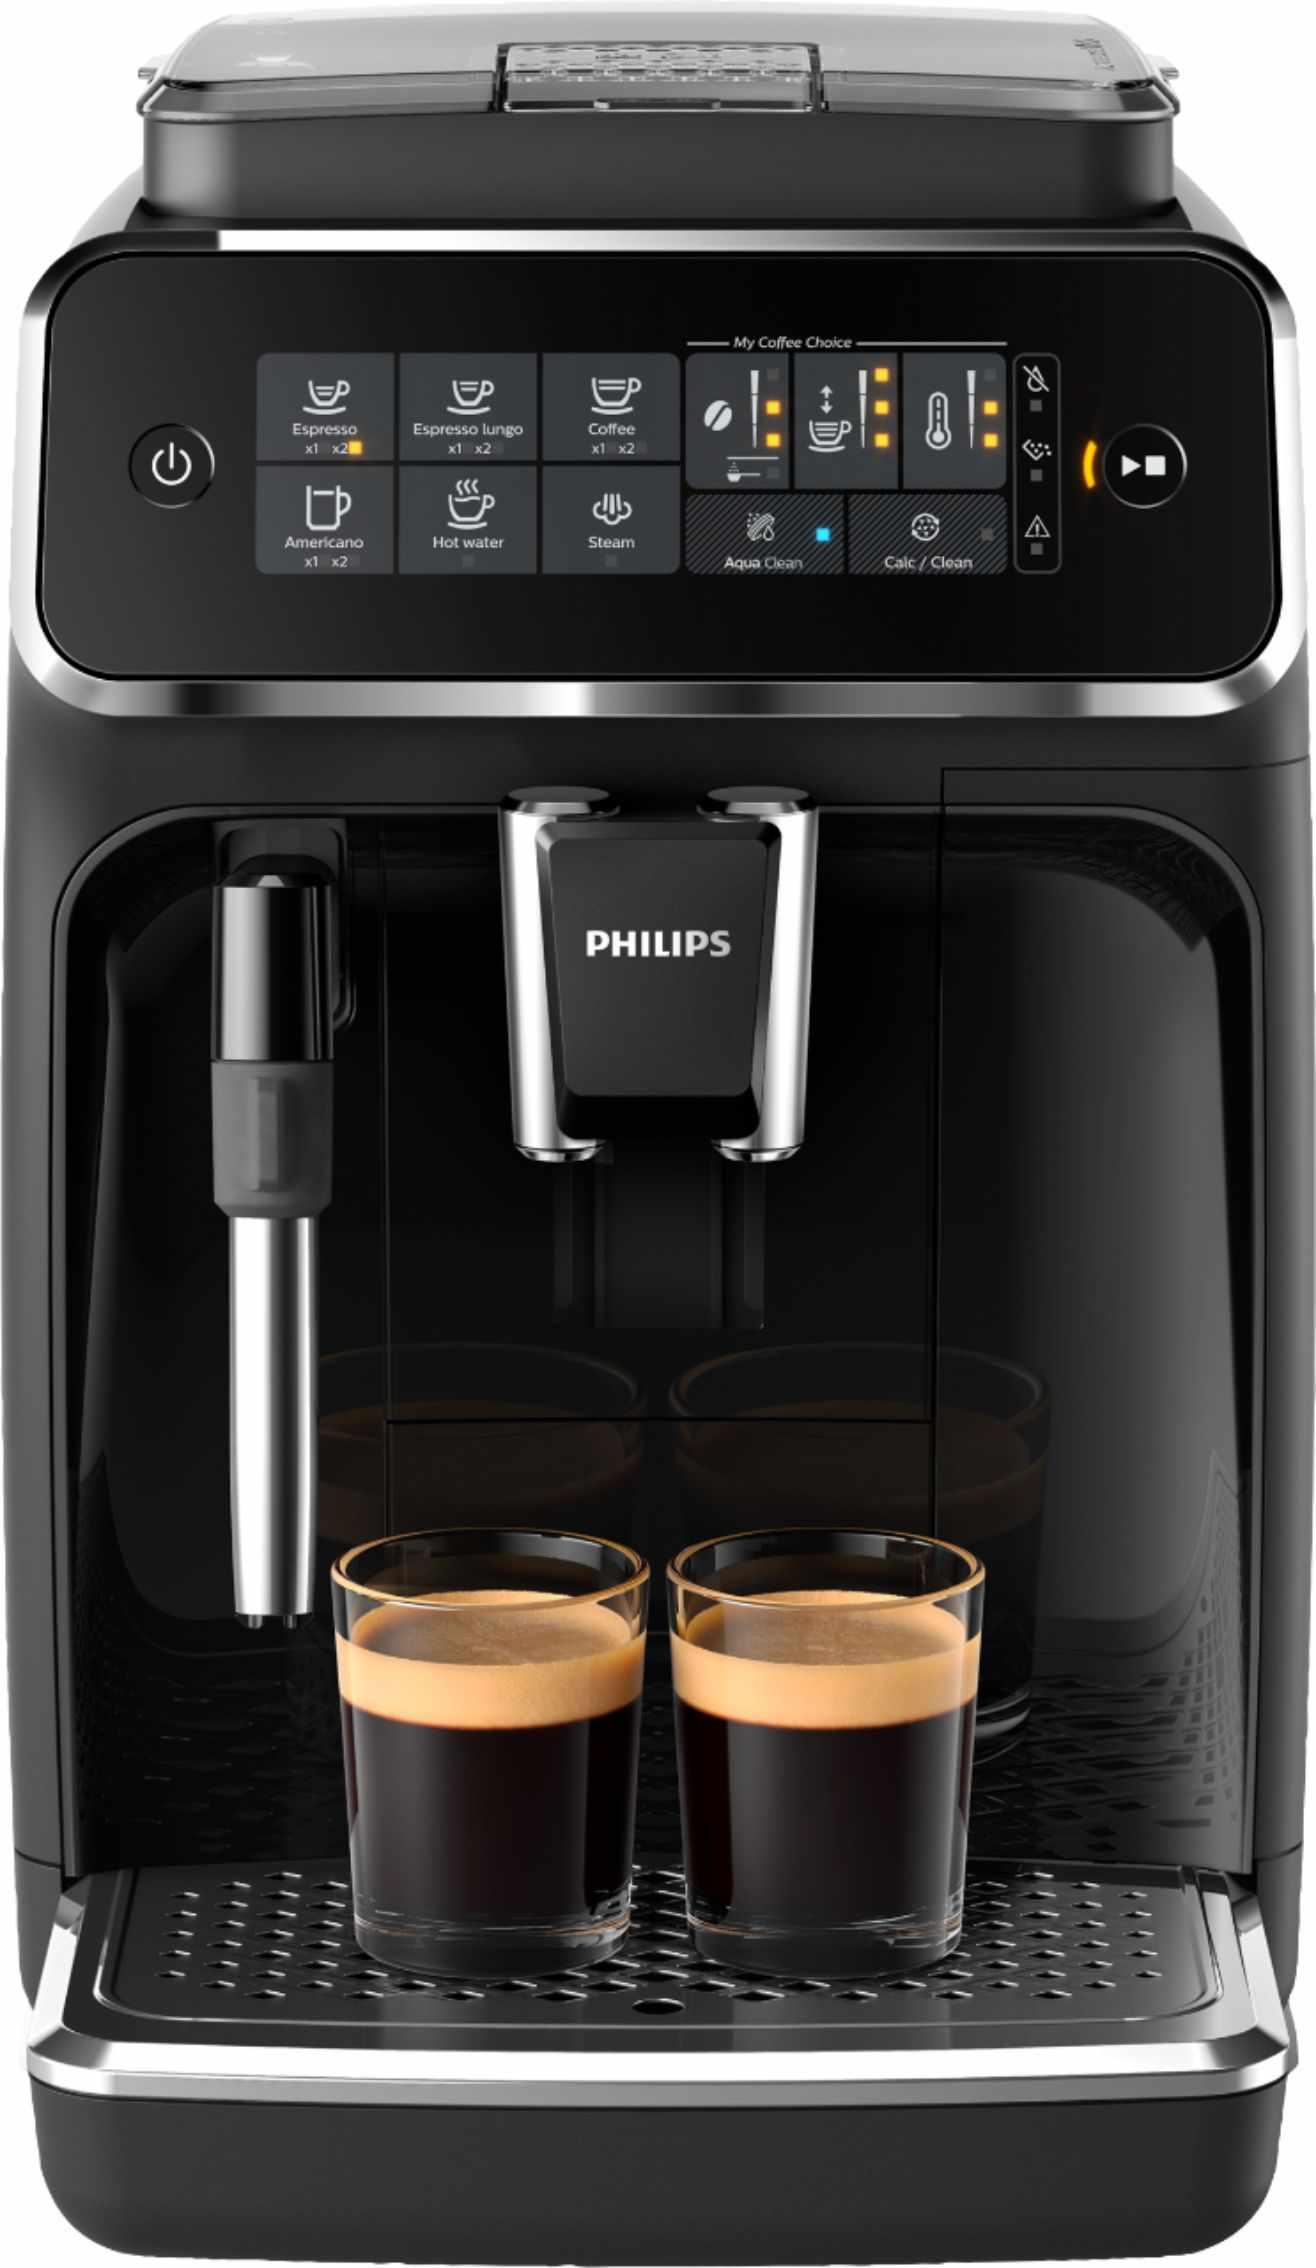 Philips 3200 Fully Automatic Espresso Machine